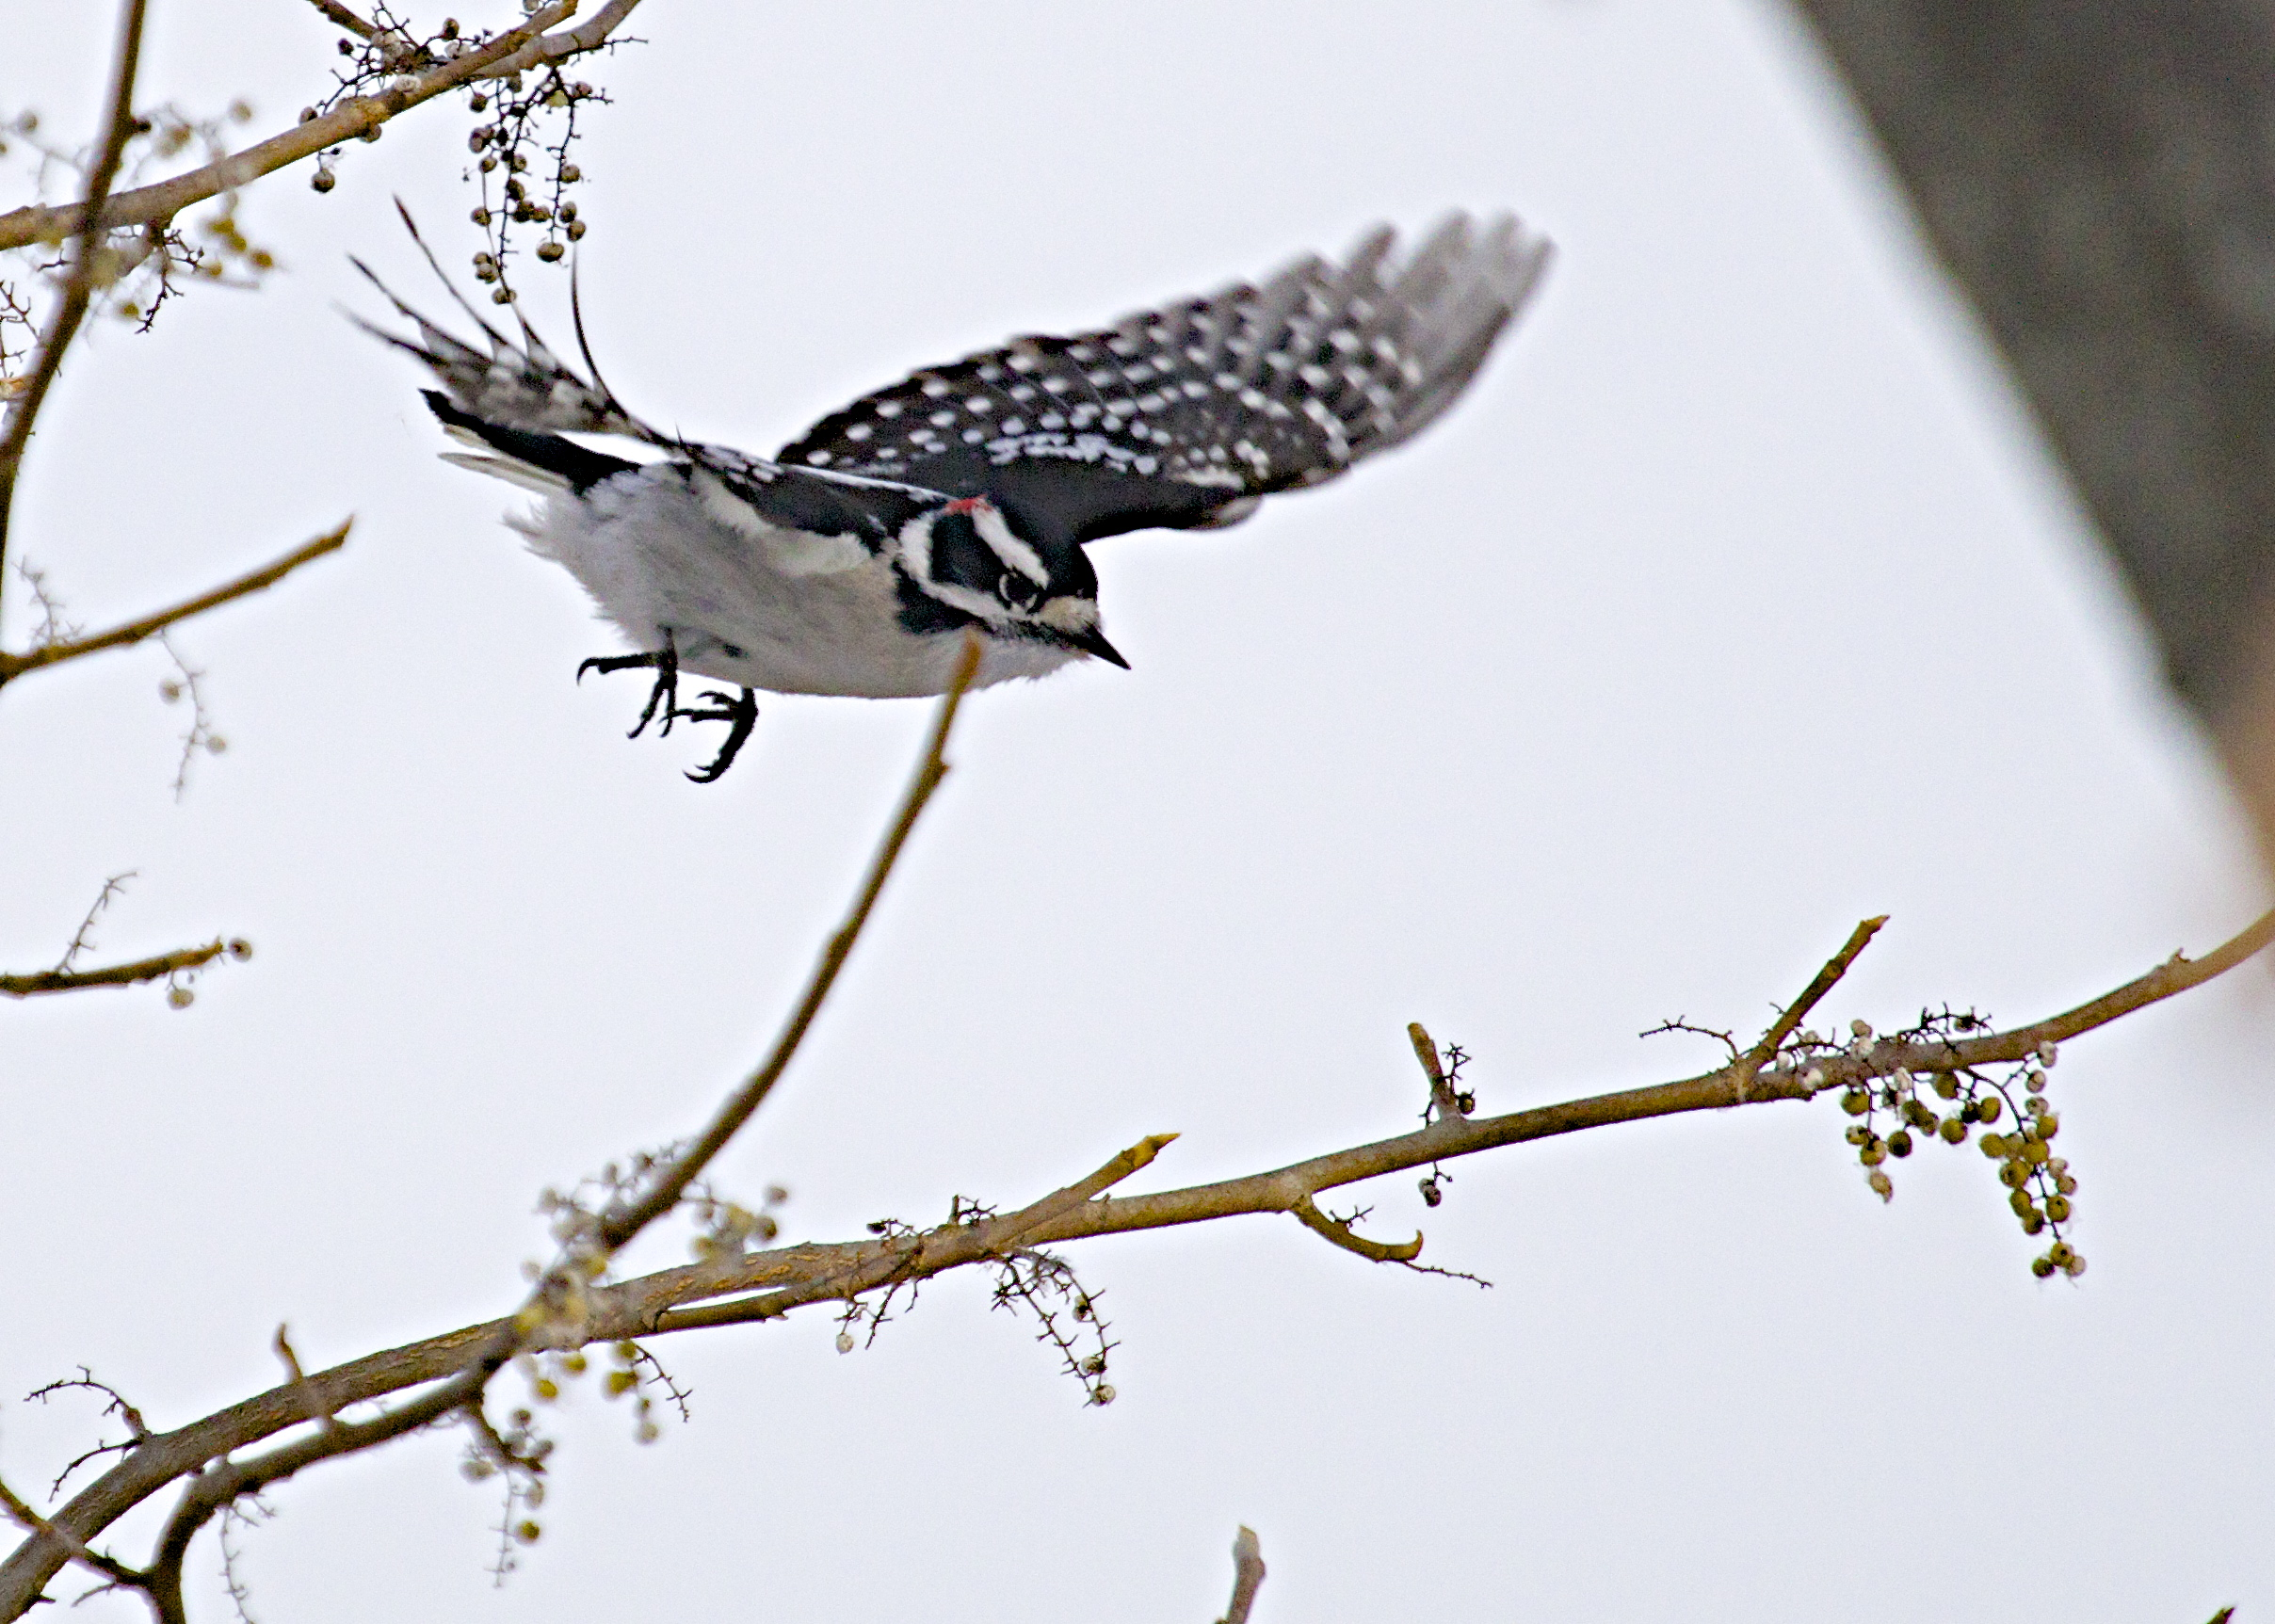 Downy Woodpecker at 6 1/2 Station Road Sanctuary, 12/12/13.